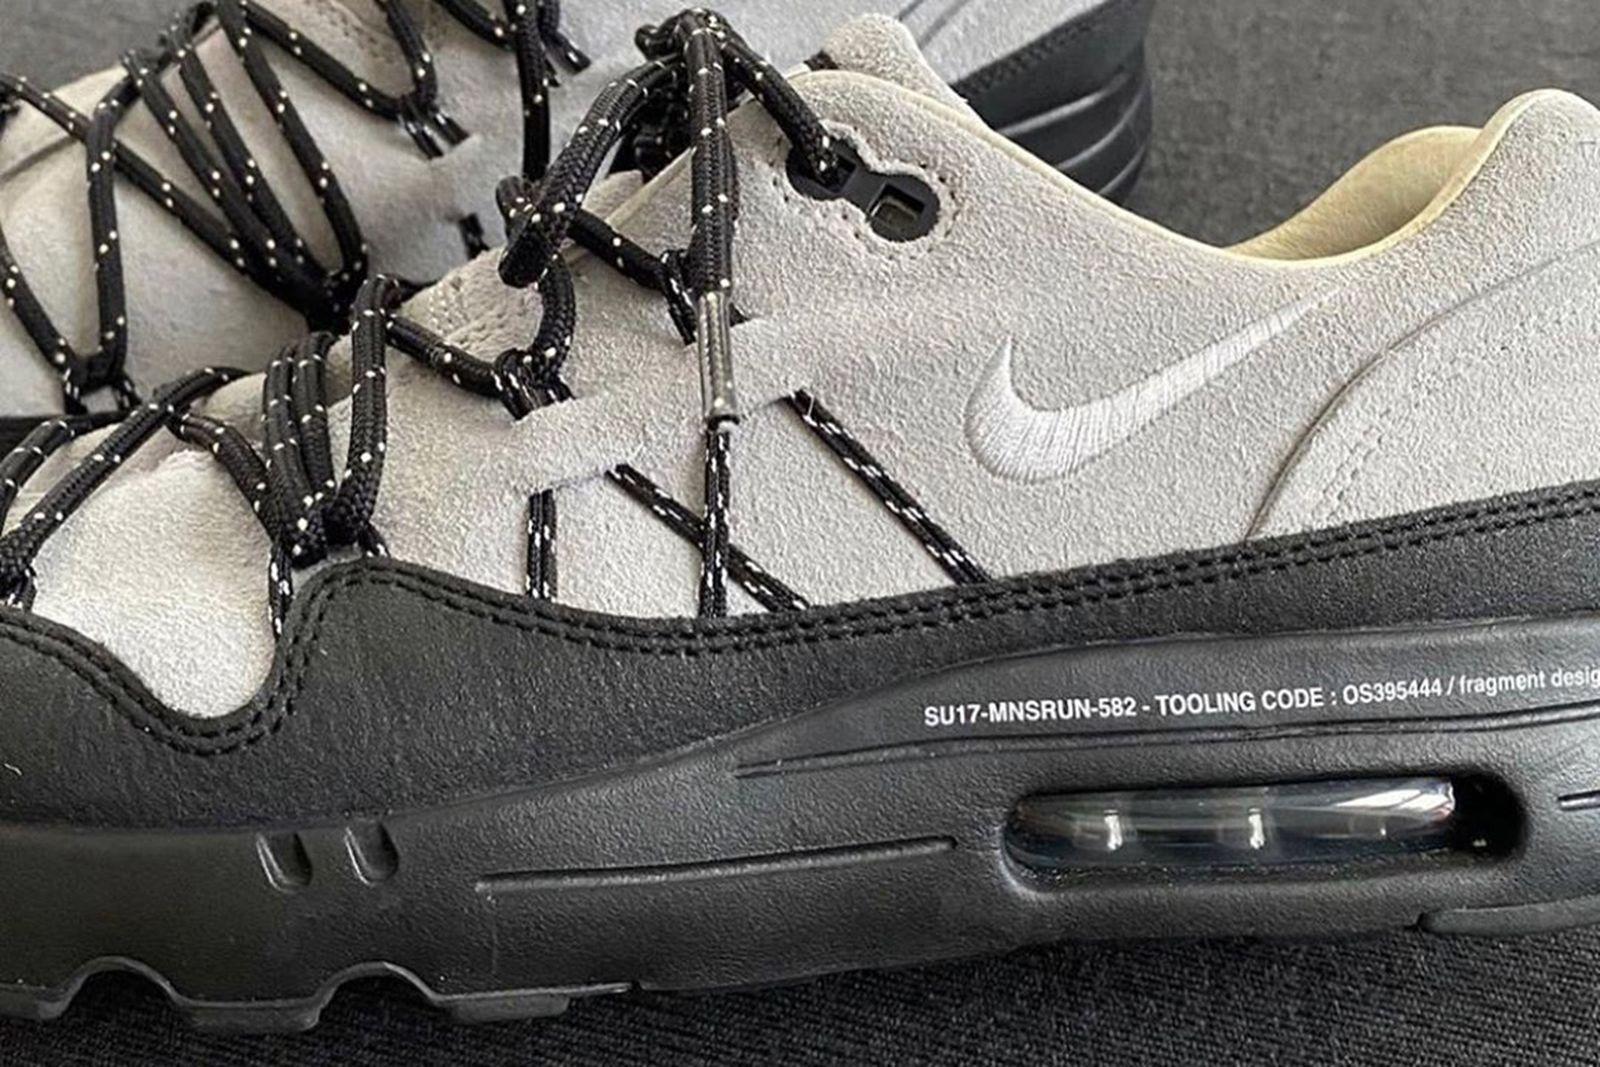 Side profile view of Hiroshi Fujiwara's Nike Air Max 1 in grey and black